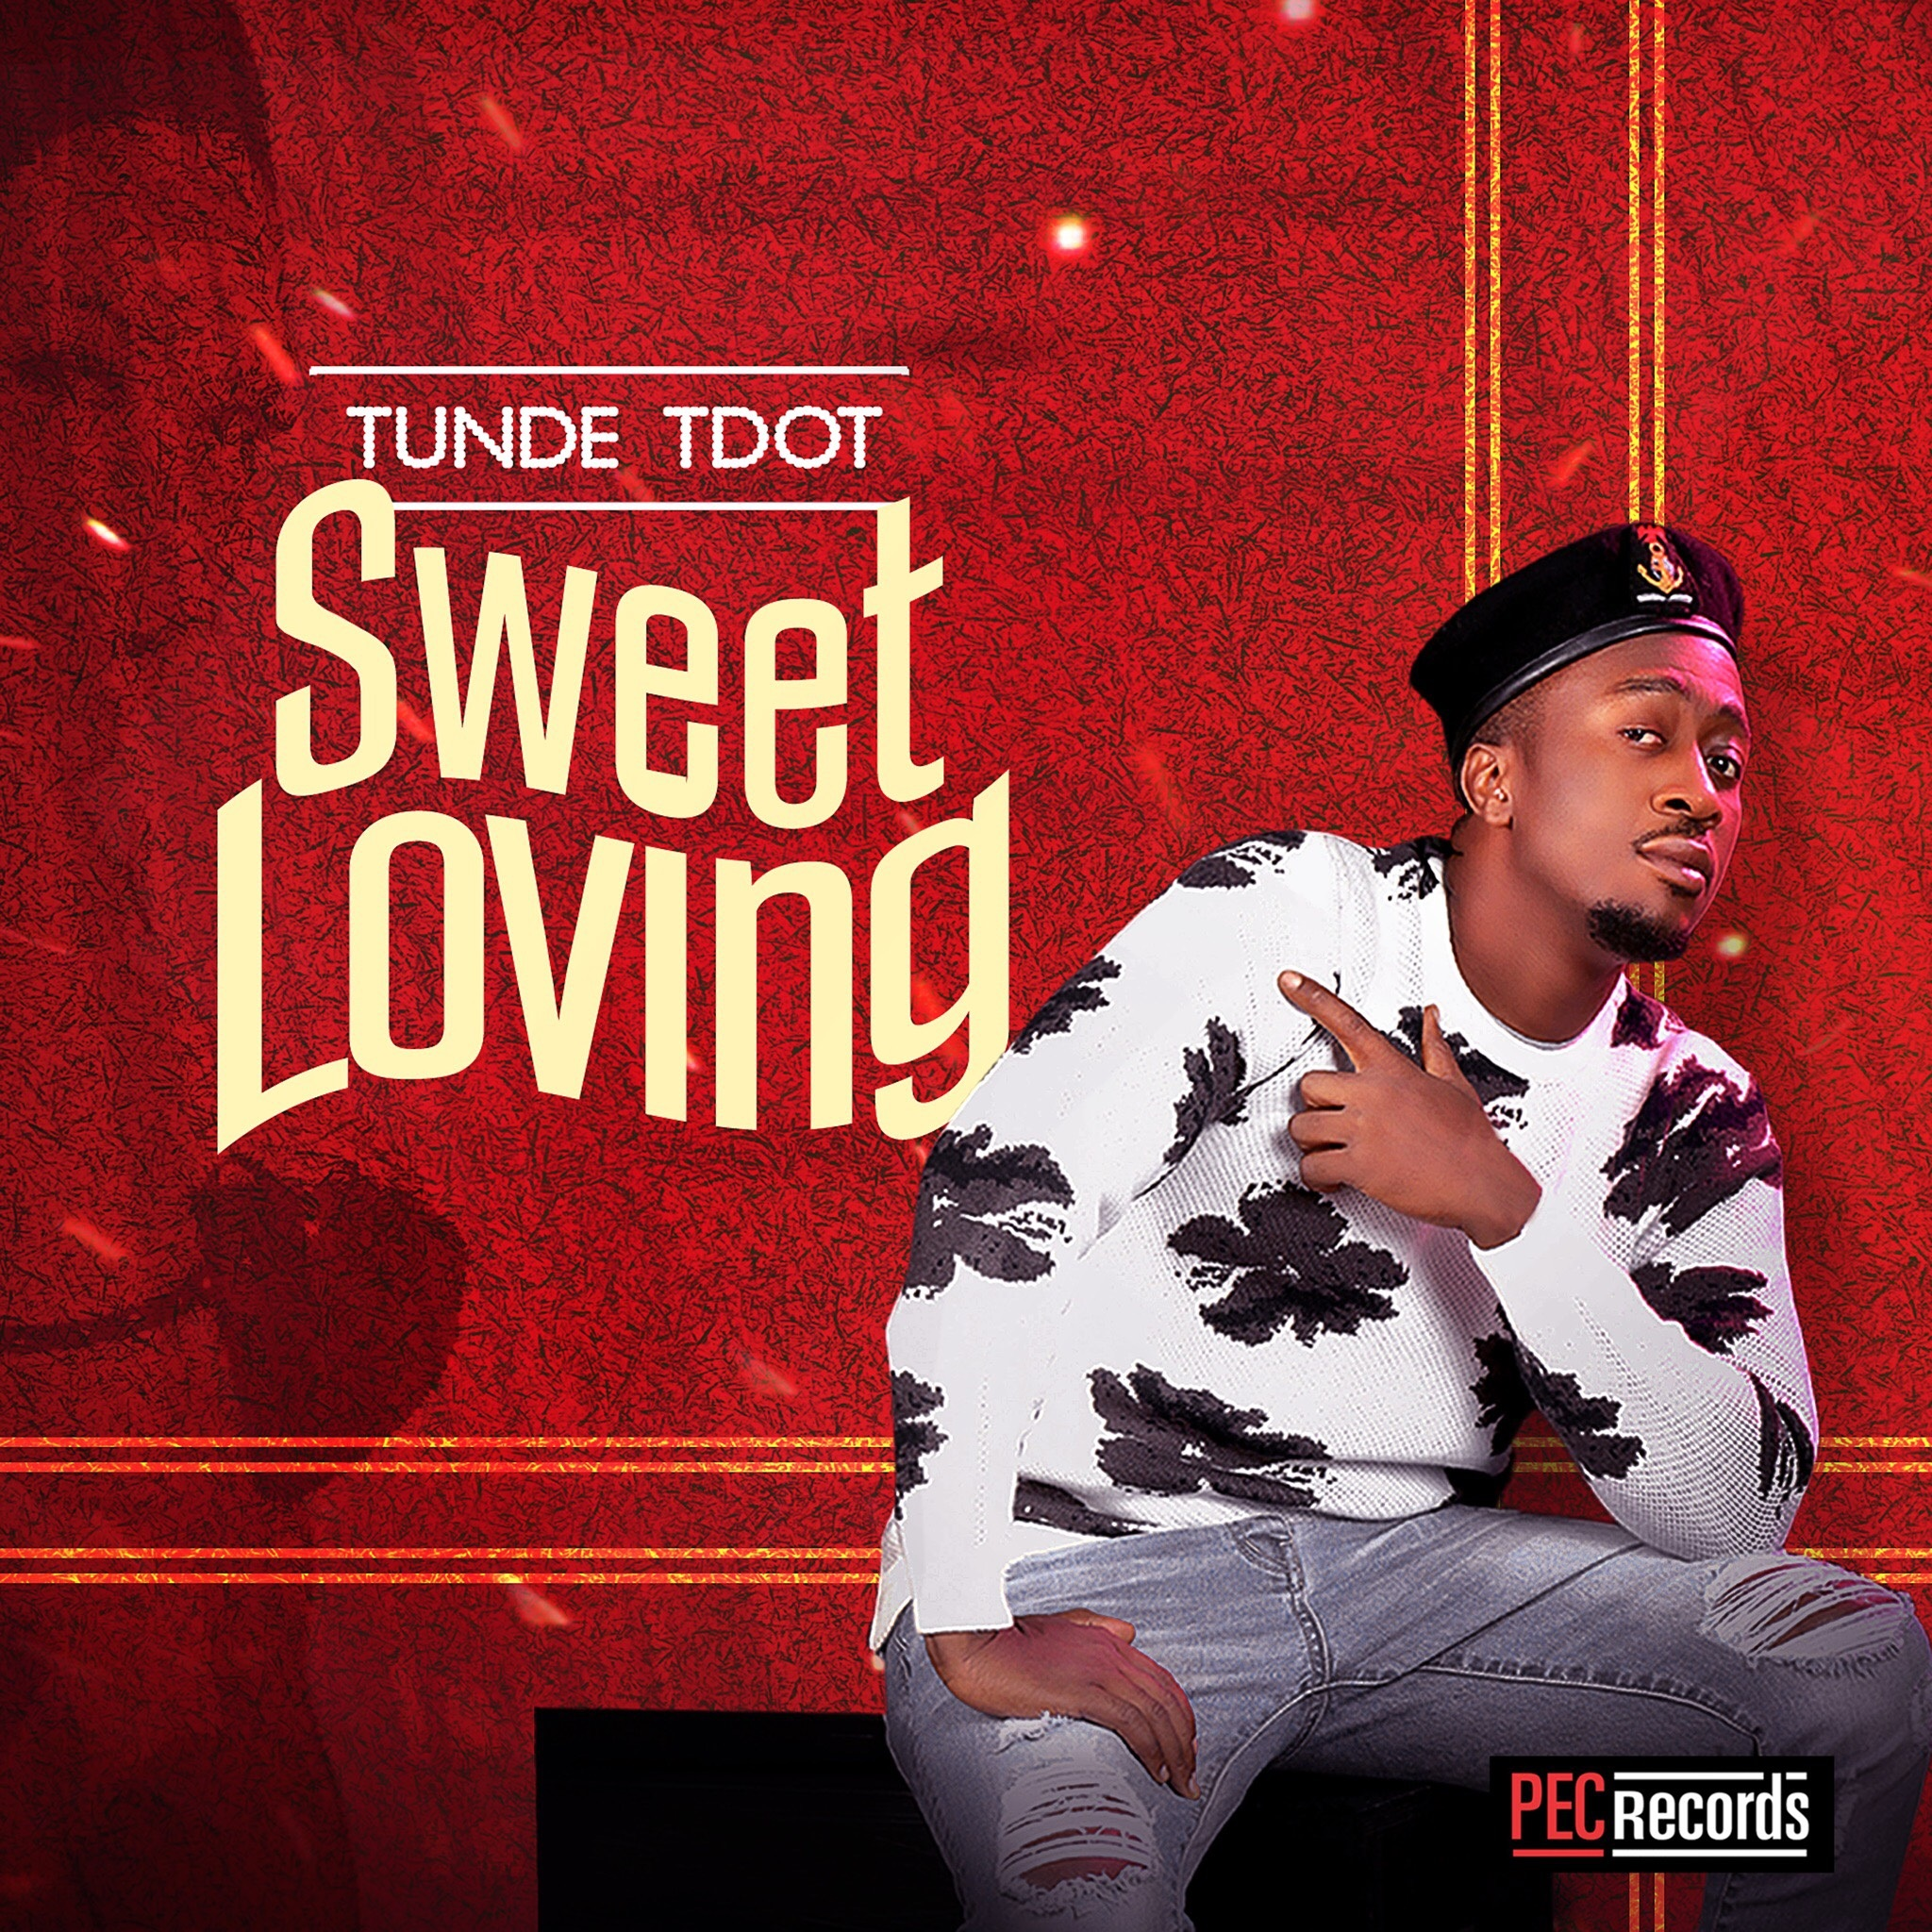 Tunde Tdot - Sweet Loving (Prod. by Killertunez)